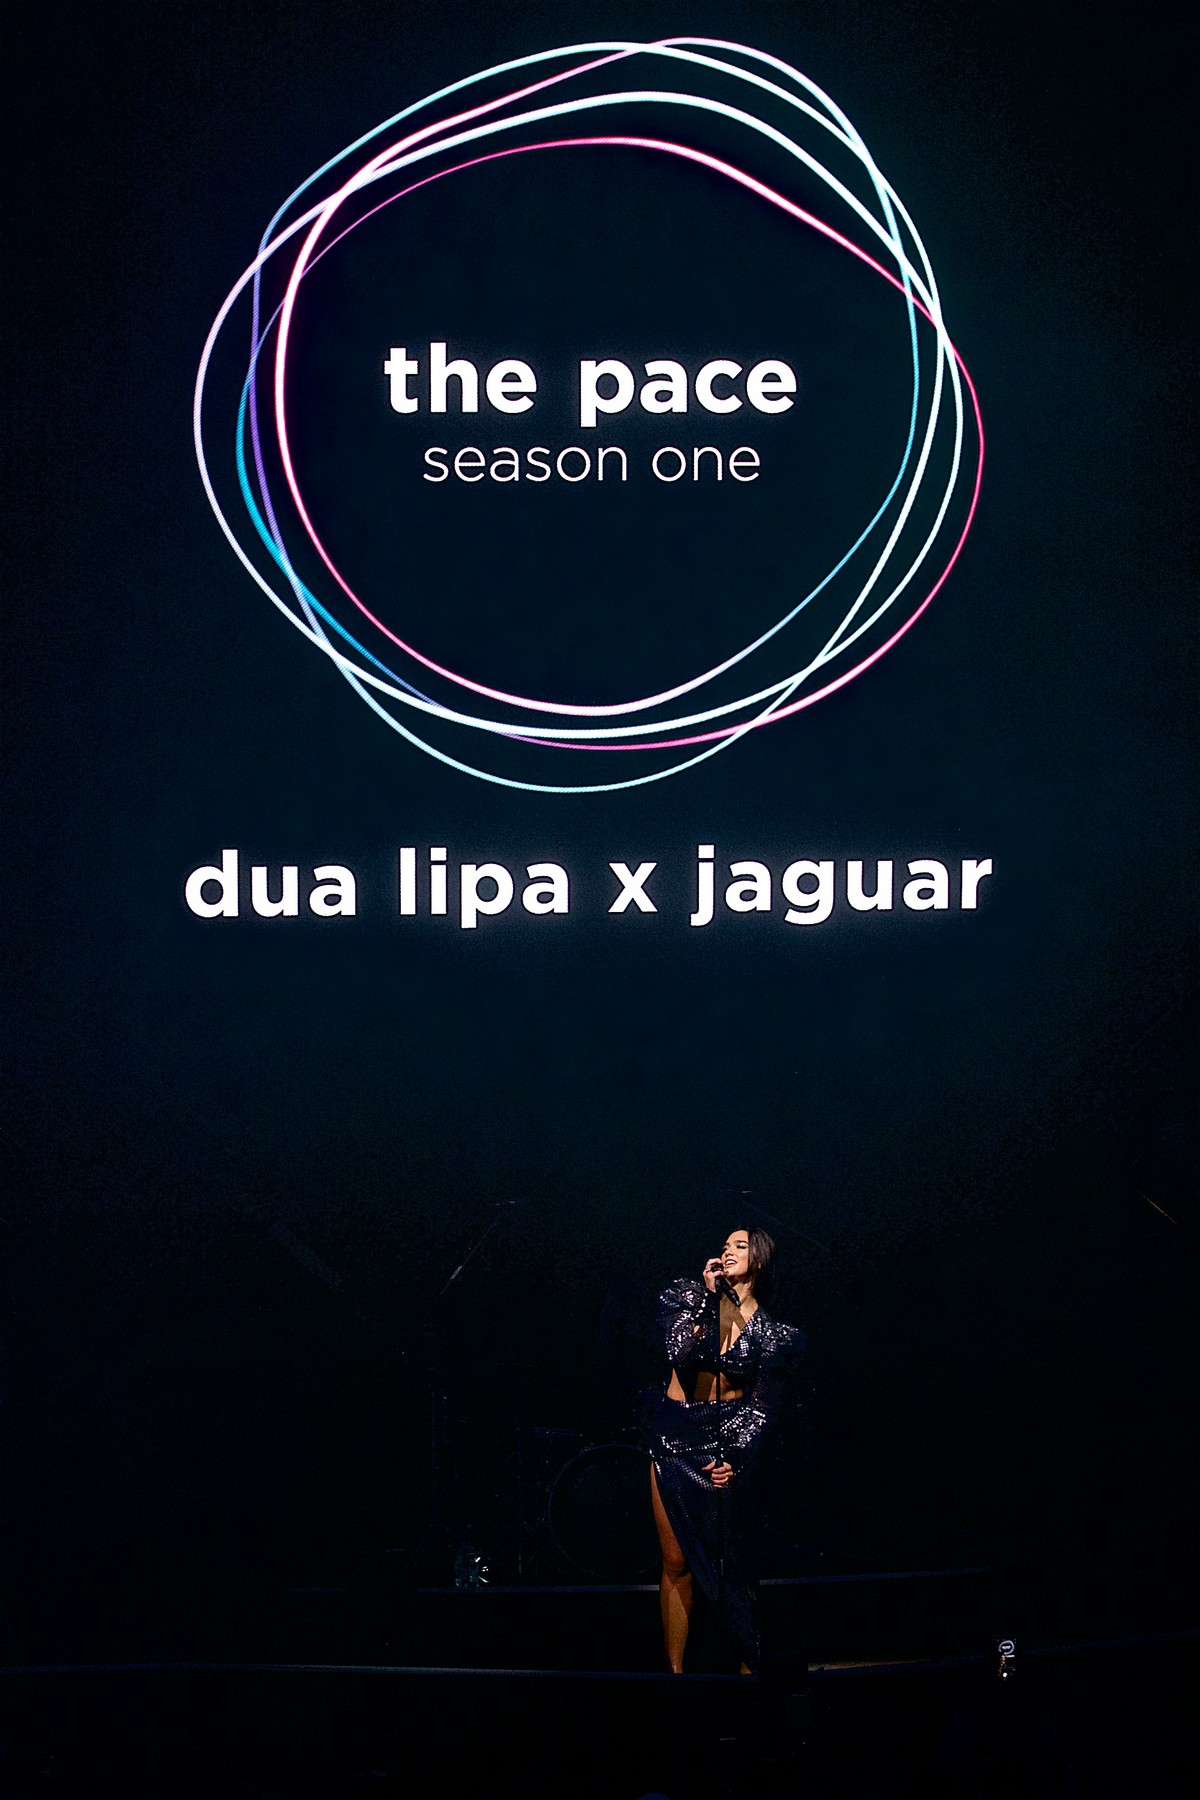 Jaguar Dua Lipa Want To